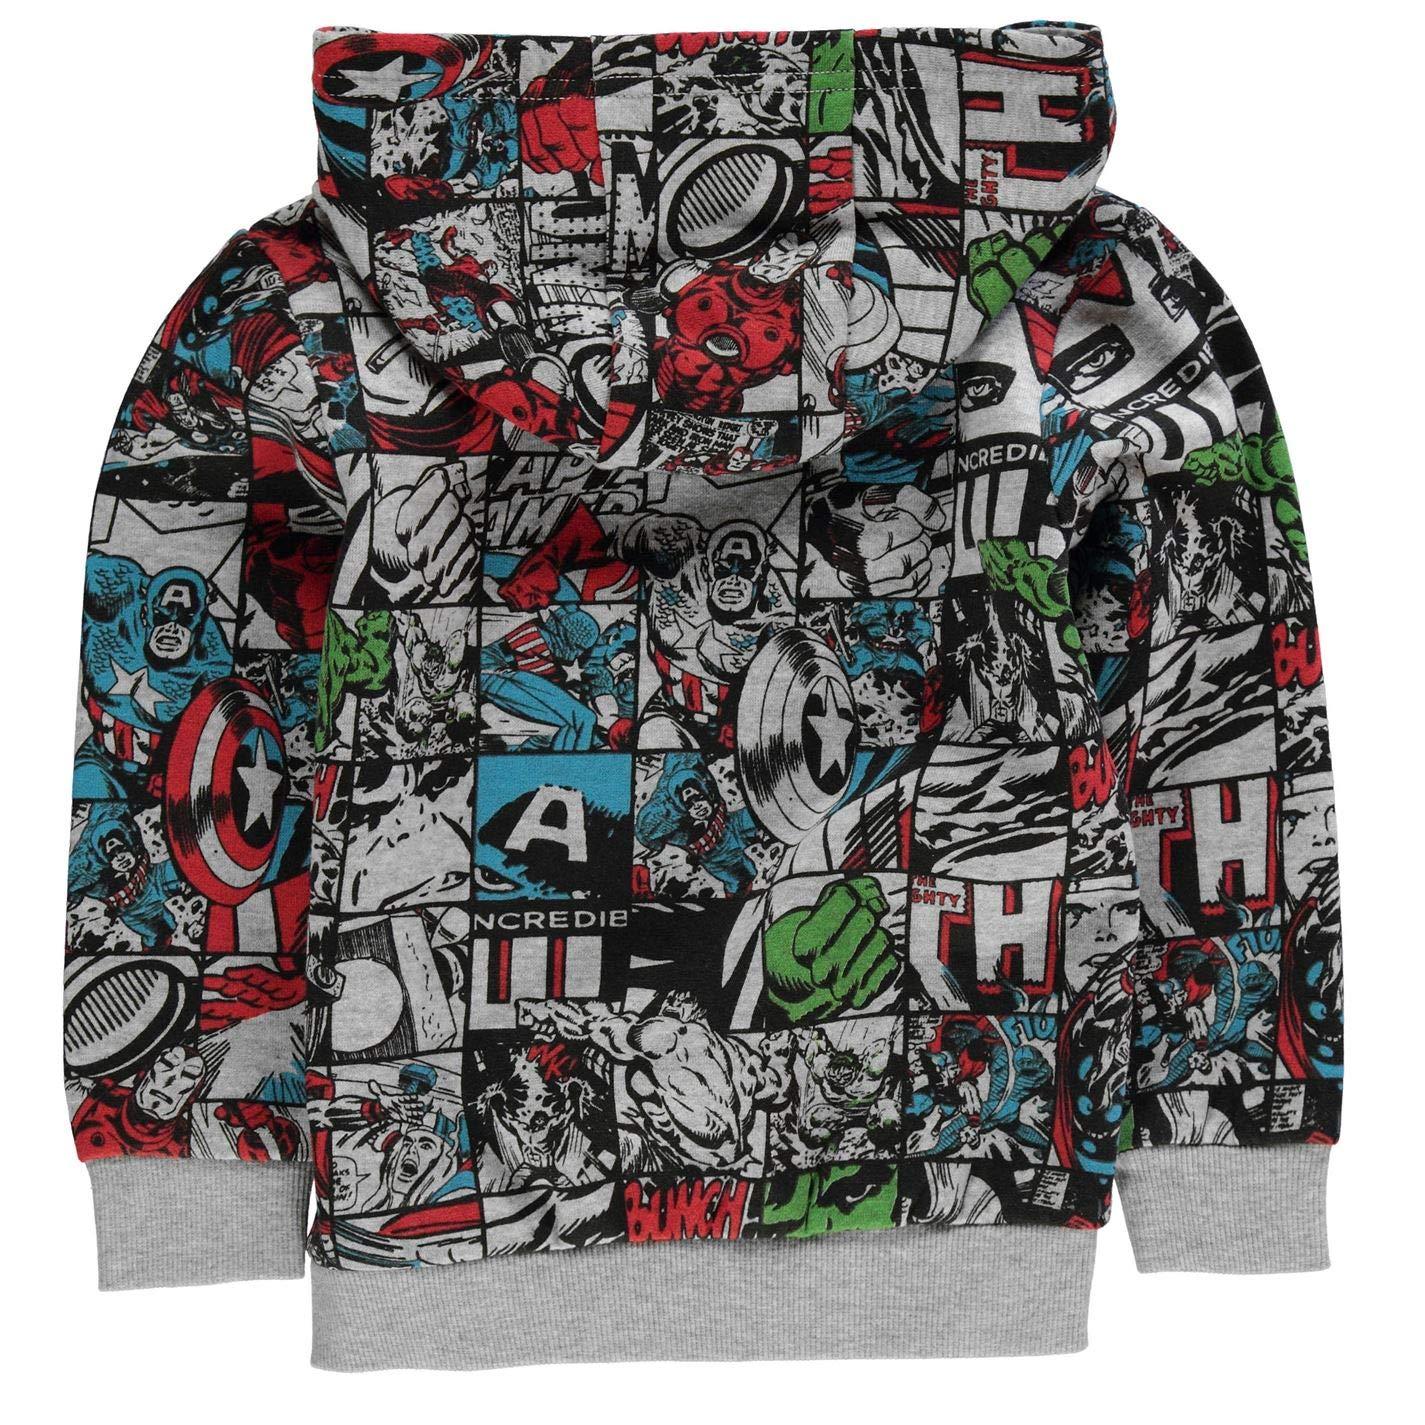 New Riot Club Grey Navy Maroon Raglan Lightweight Sweatshirt Jumper 2-14 years